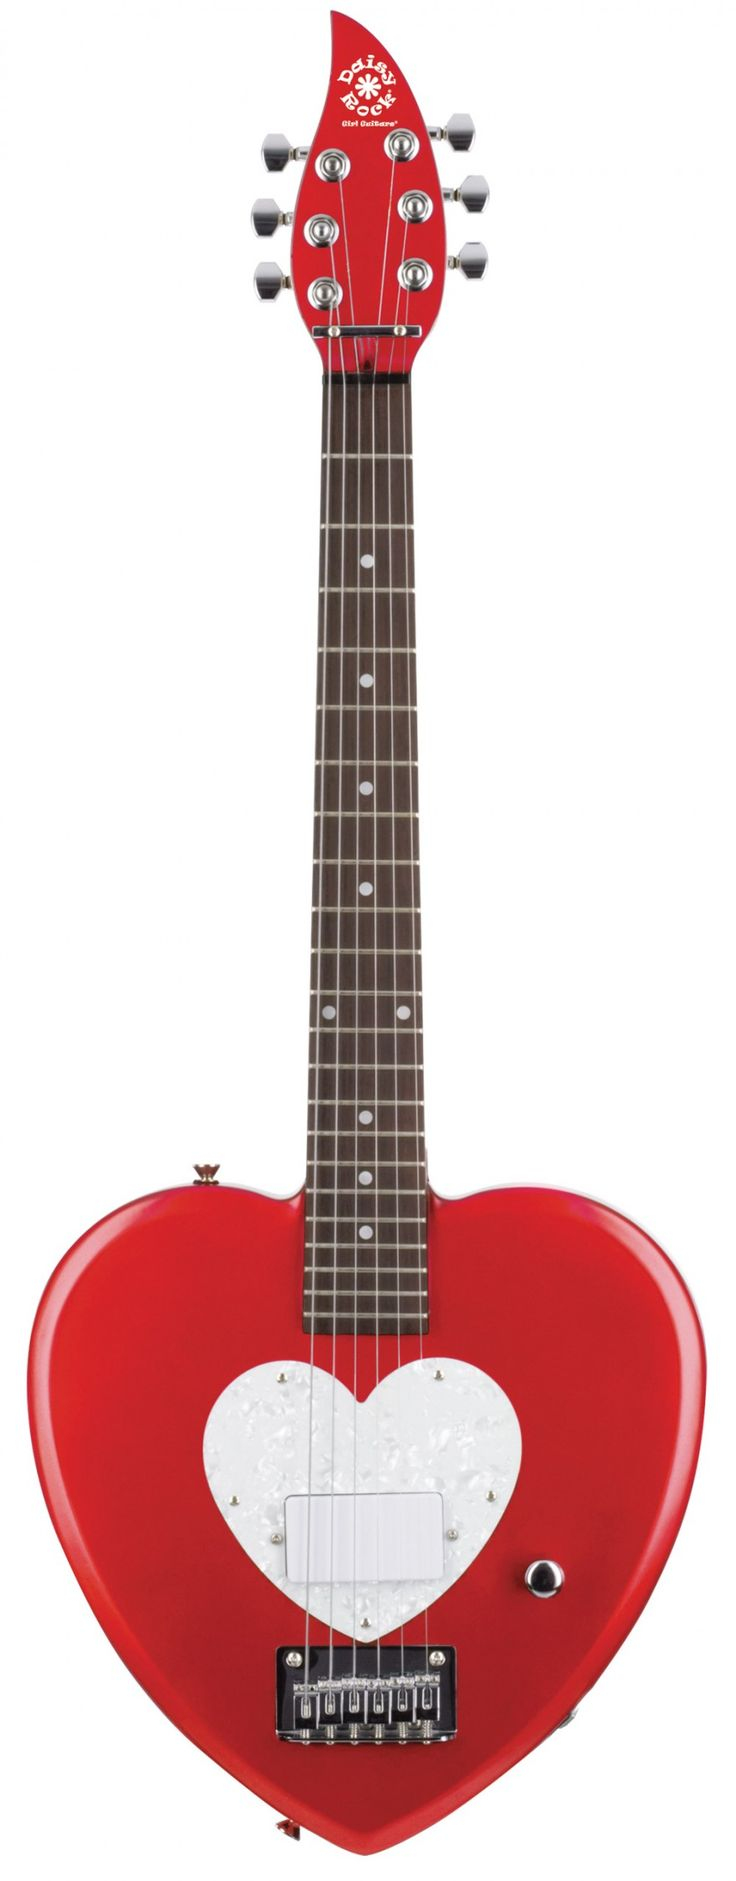 96 best electric daisy rock guitars bass guitars images on pinterest bass guitars electric. Black Bedroom Furniture Sets. Home Design Ideas